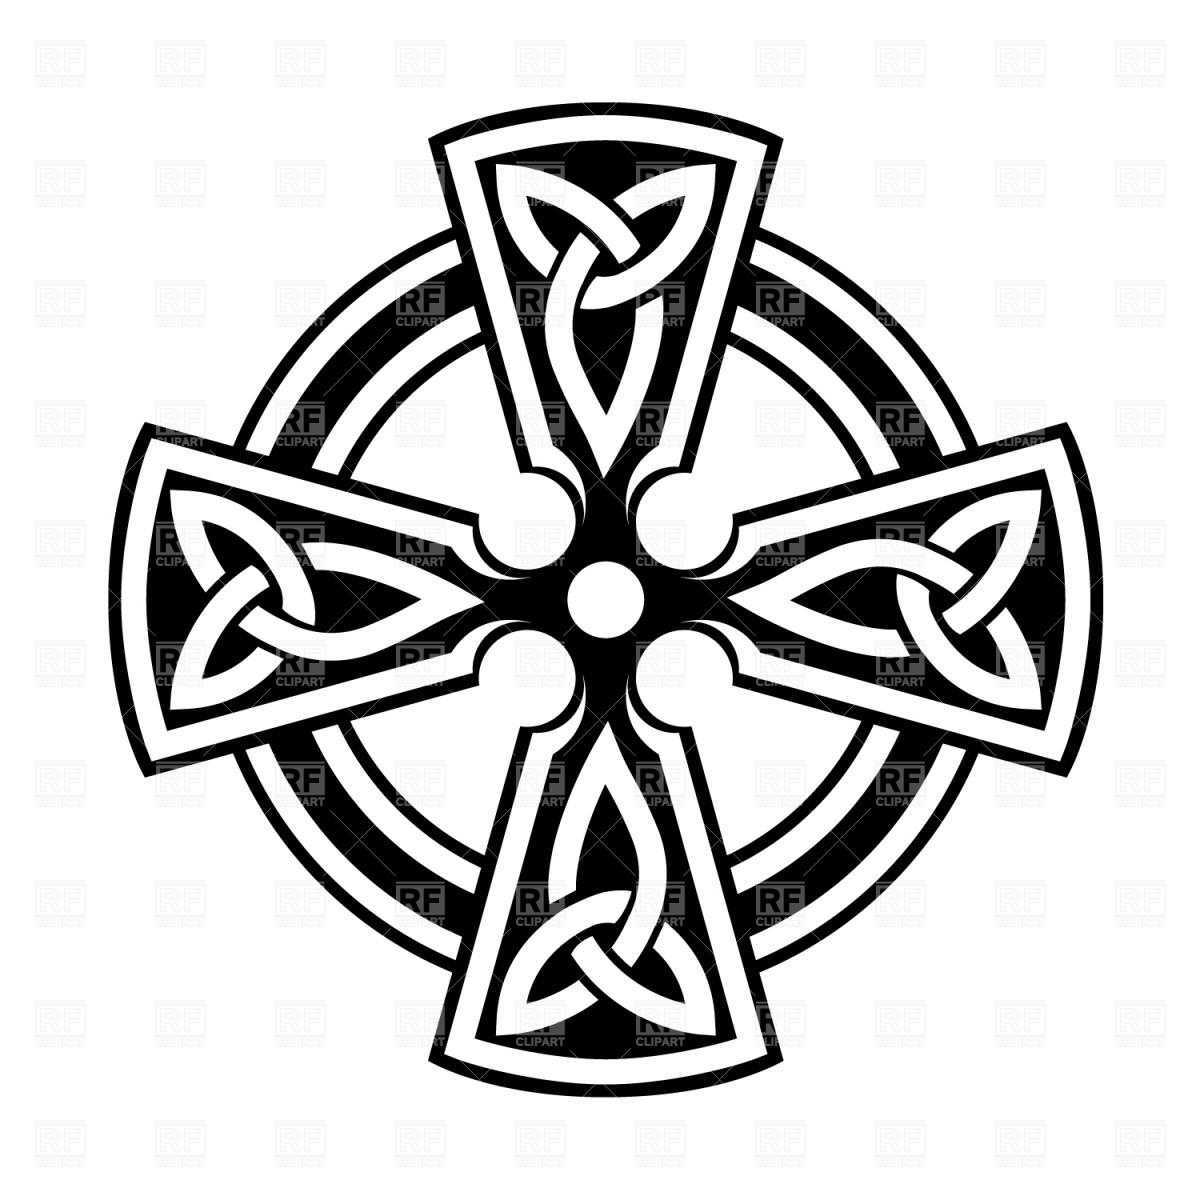 255 Celtic Cross free clipart.